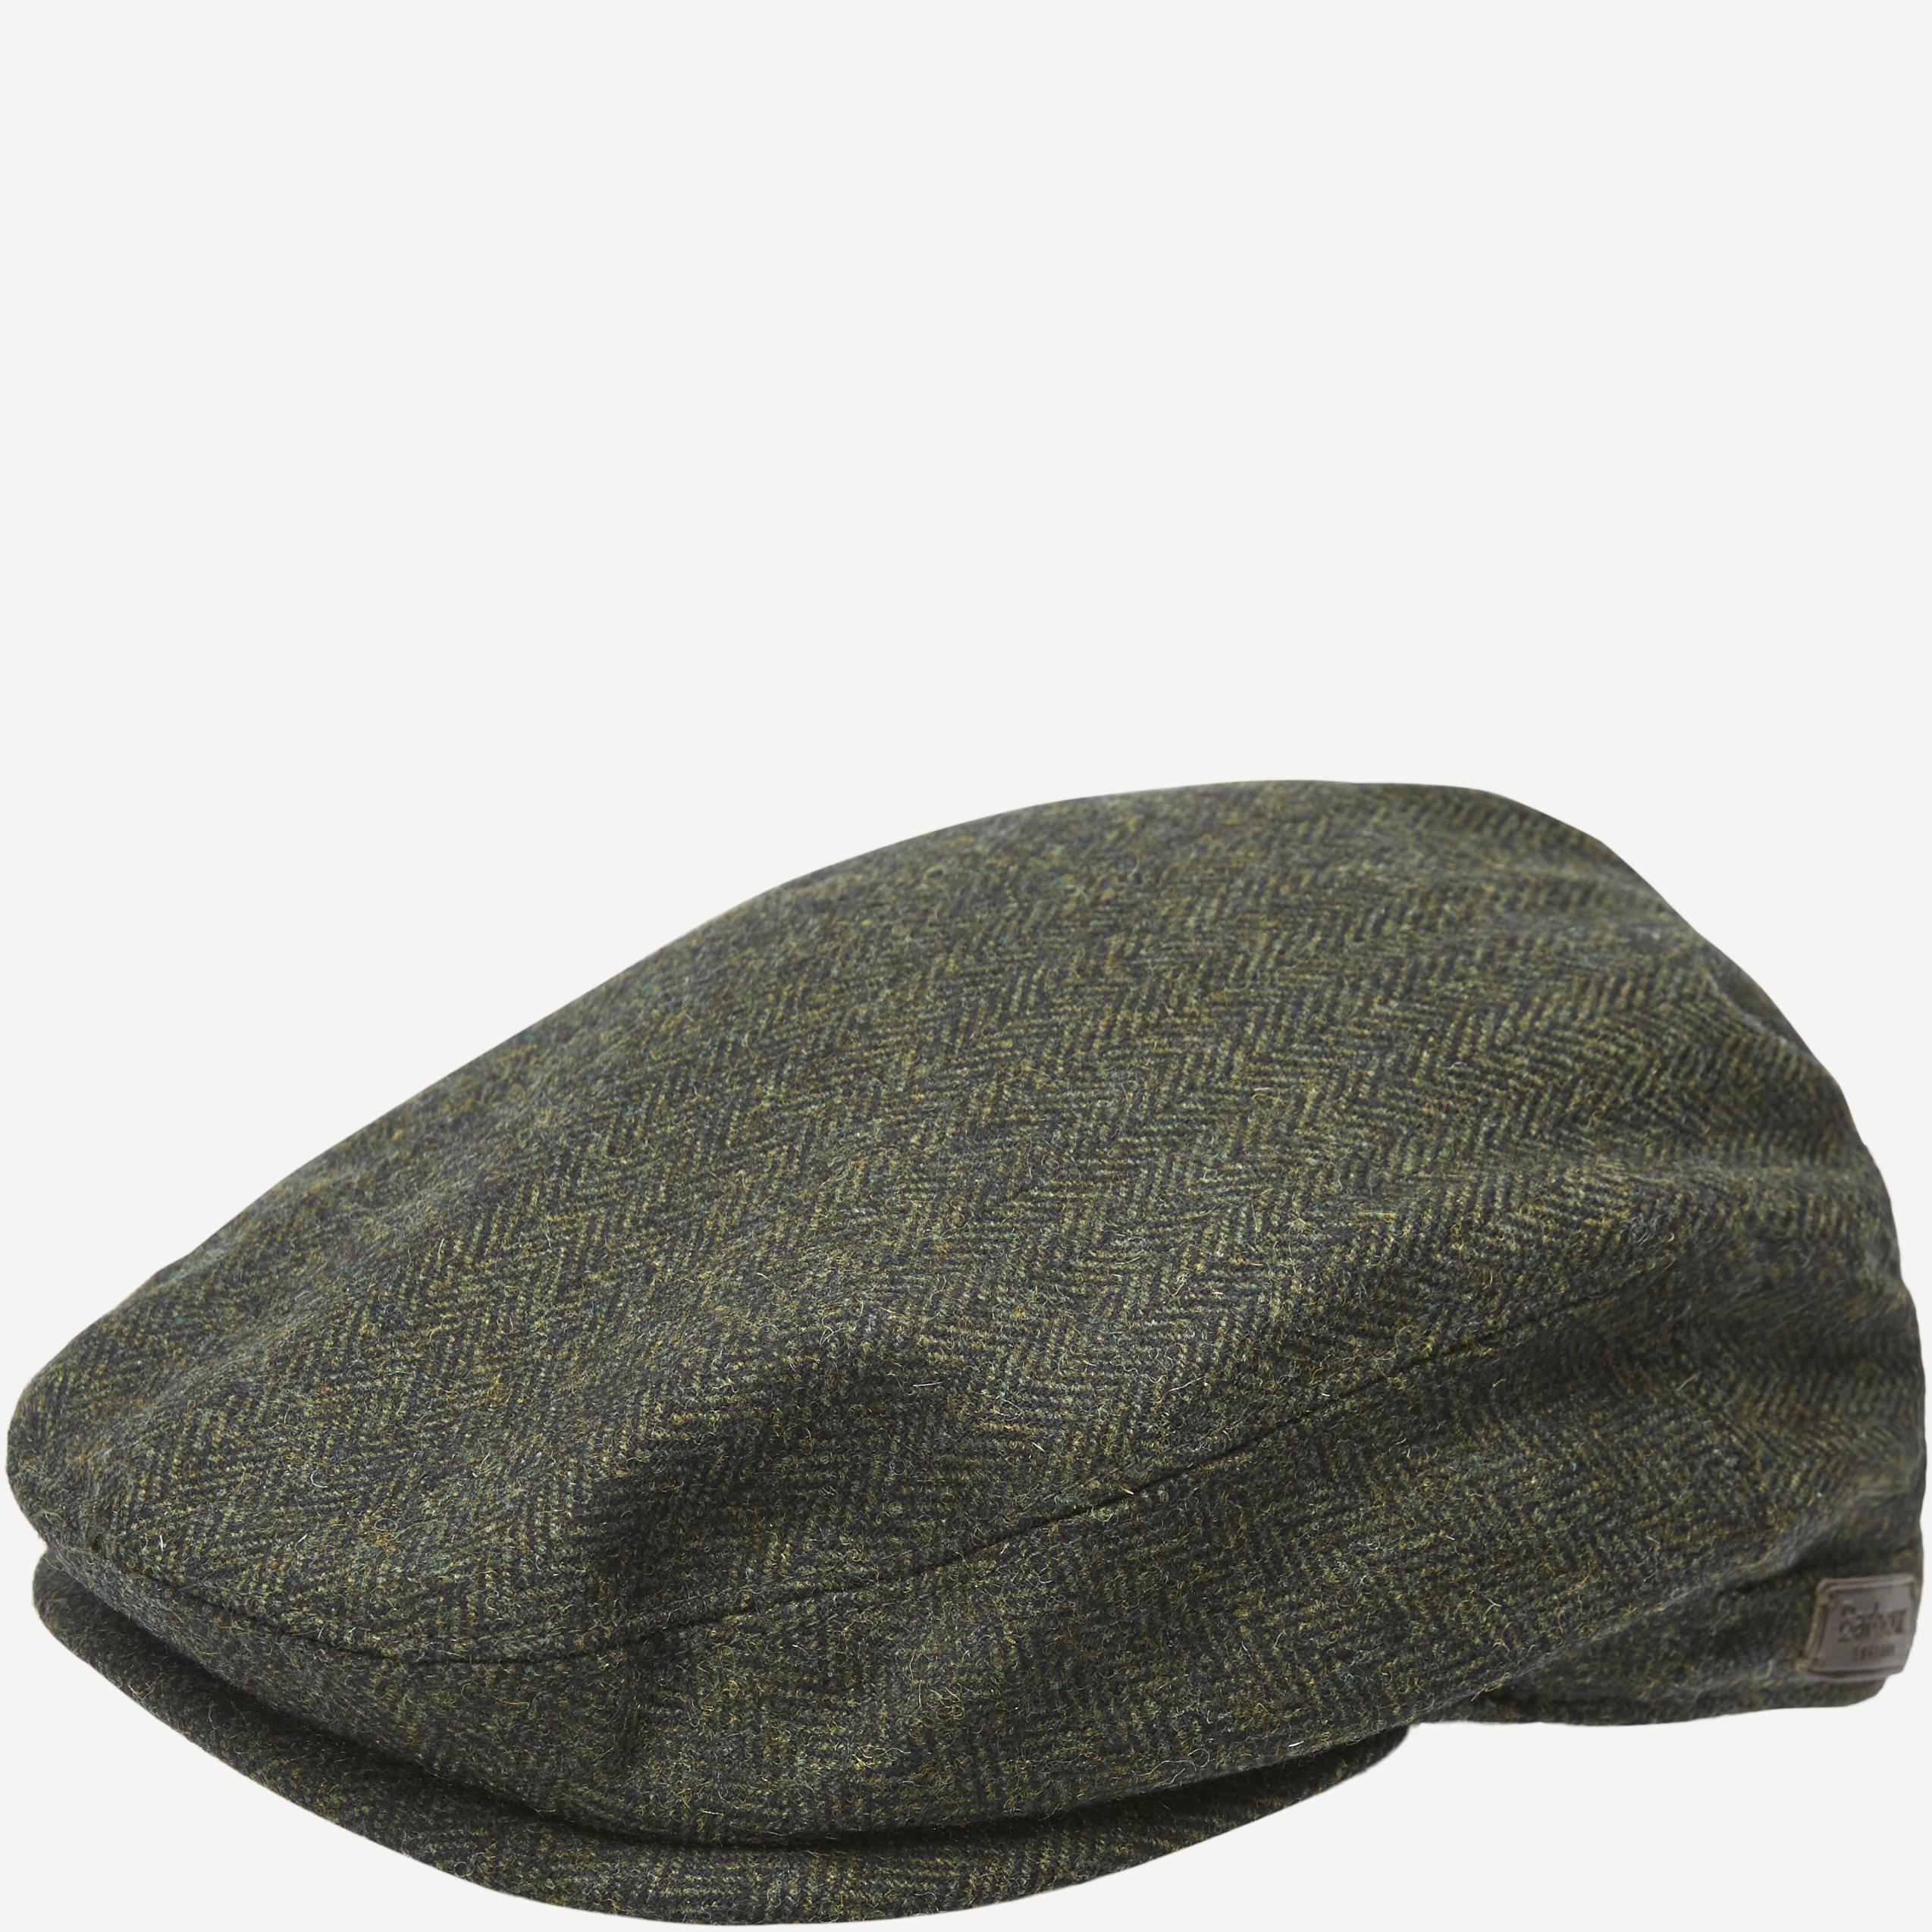 Barlow Flatcap - Caps - Army